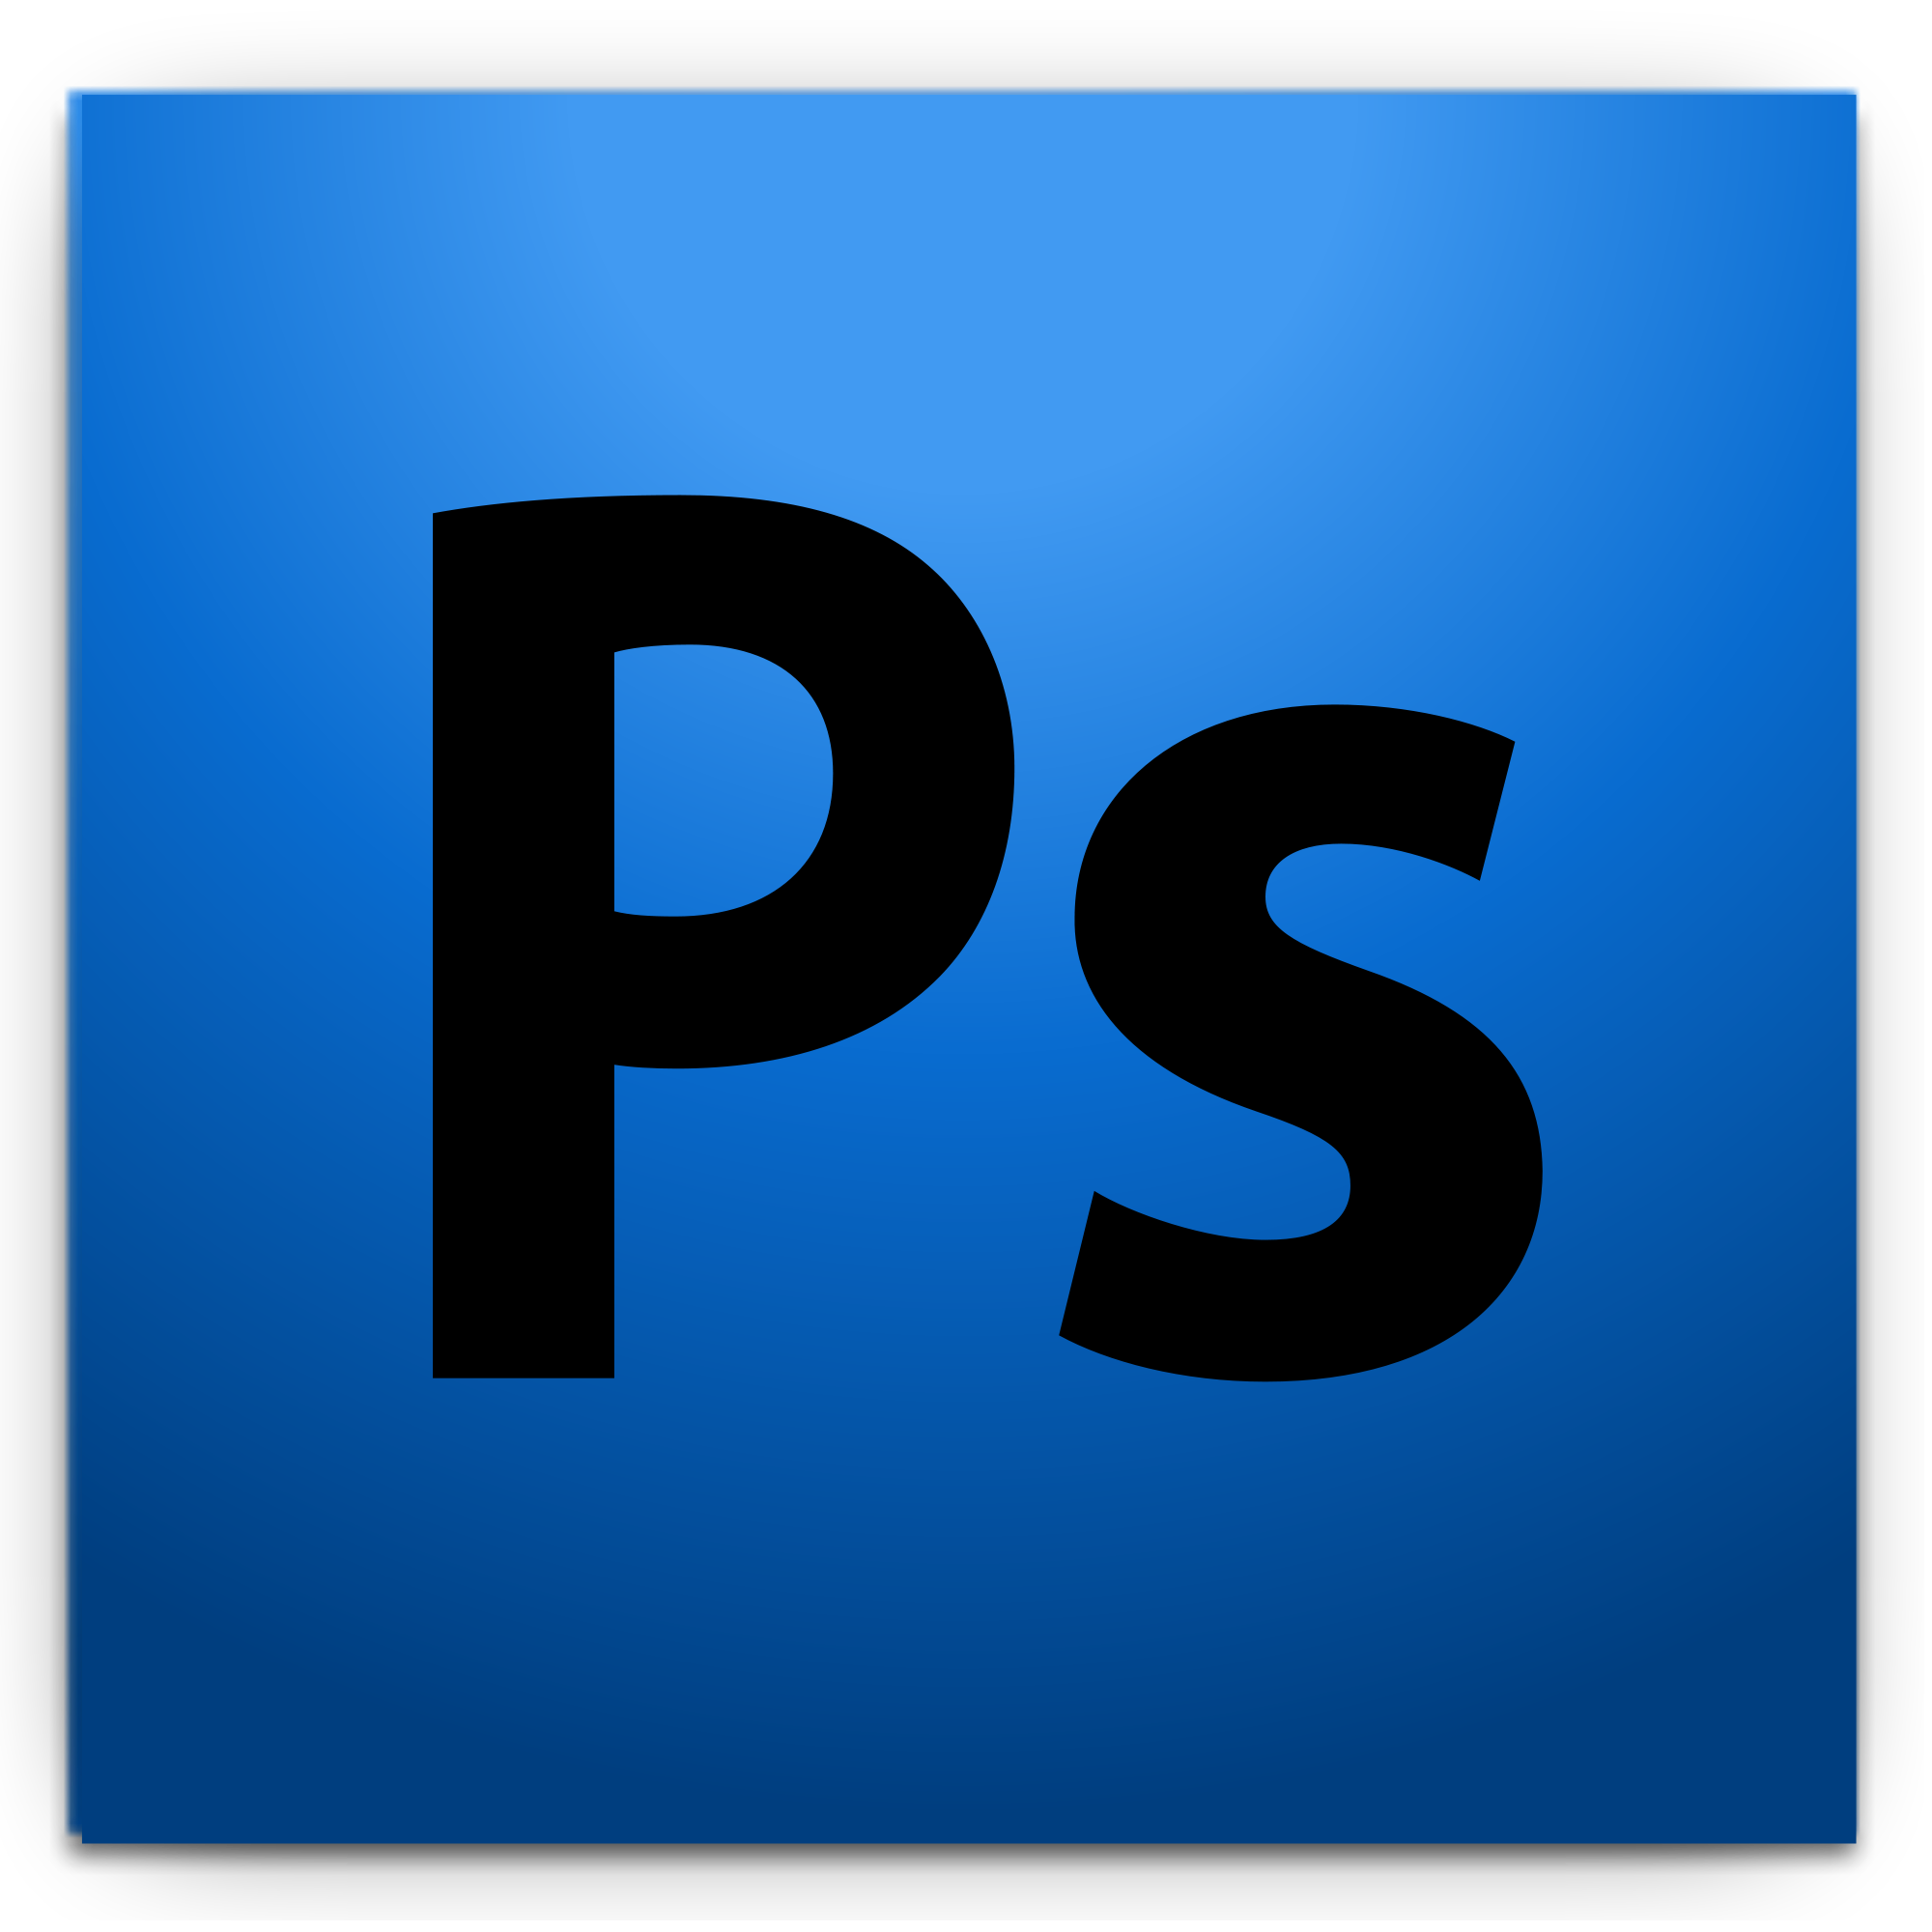 2000x2000 Adobe Photoshop Adobe Photoshop Logo Icon Vector Free Download